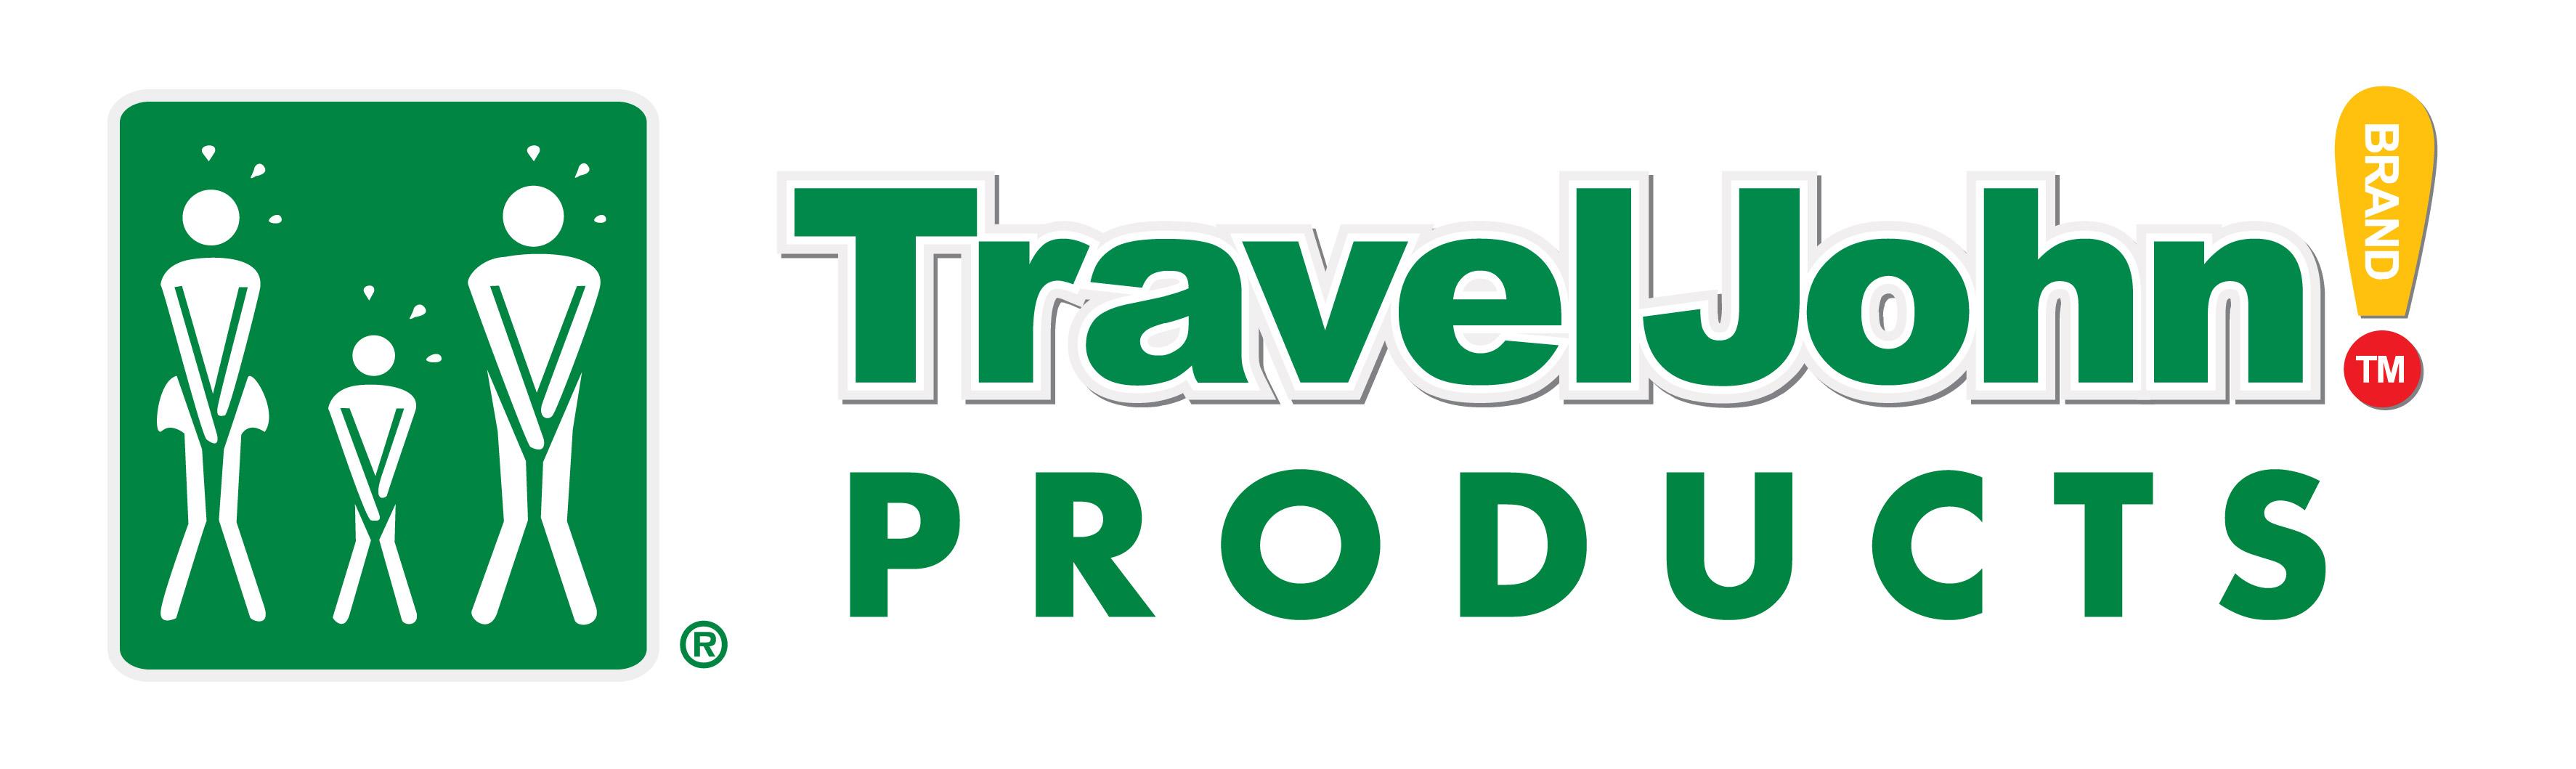 TravelJohn Products